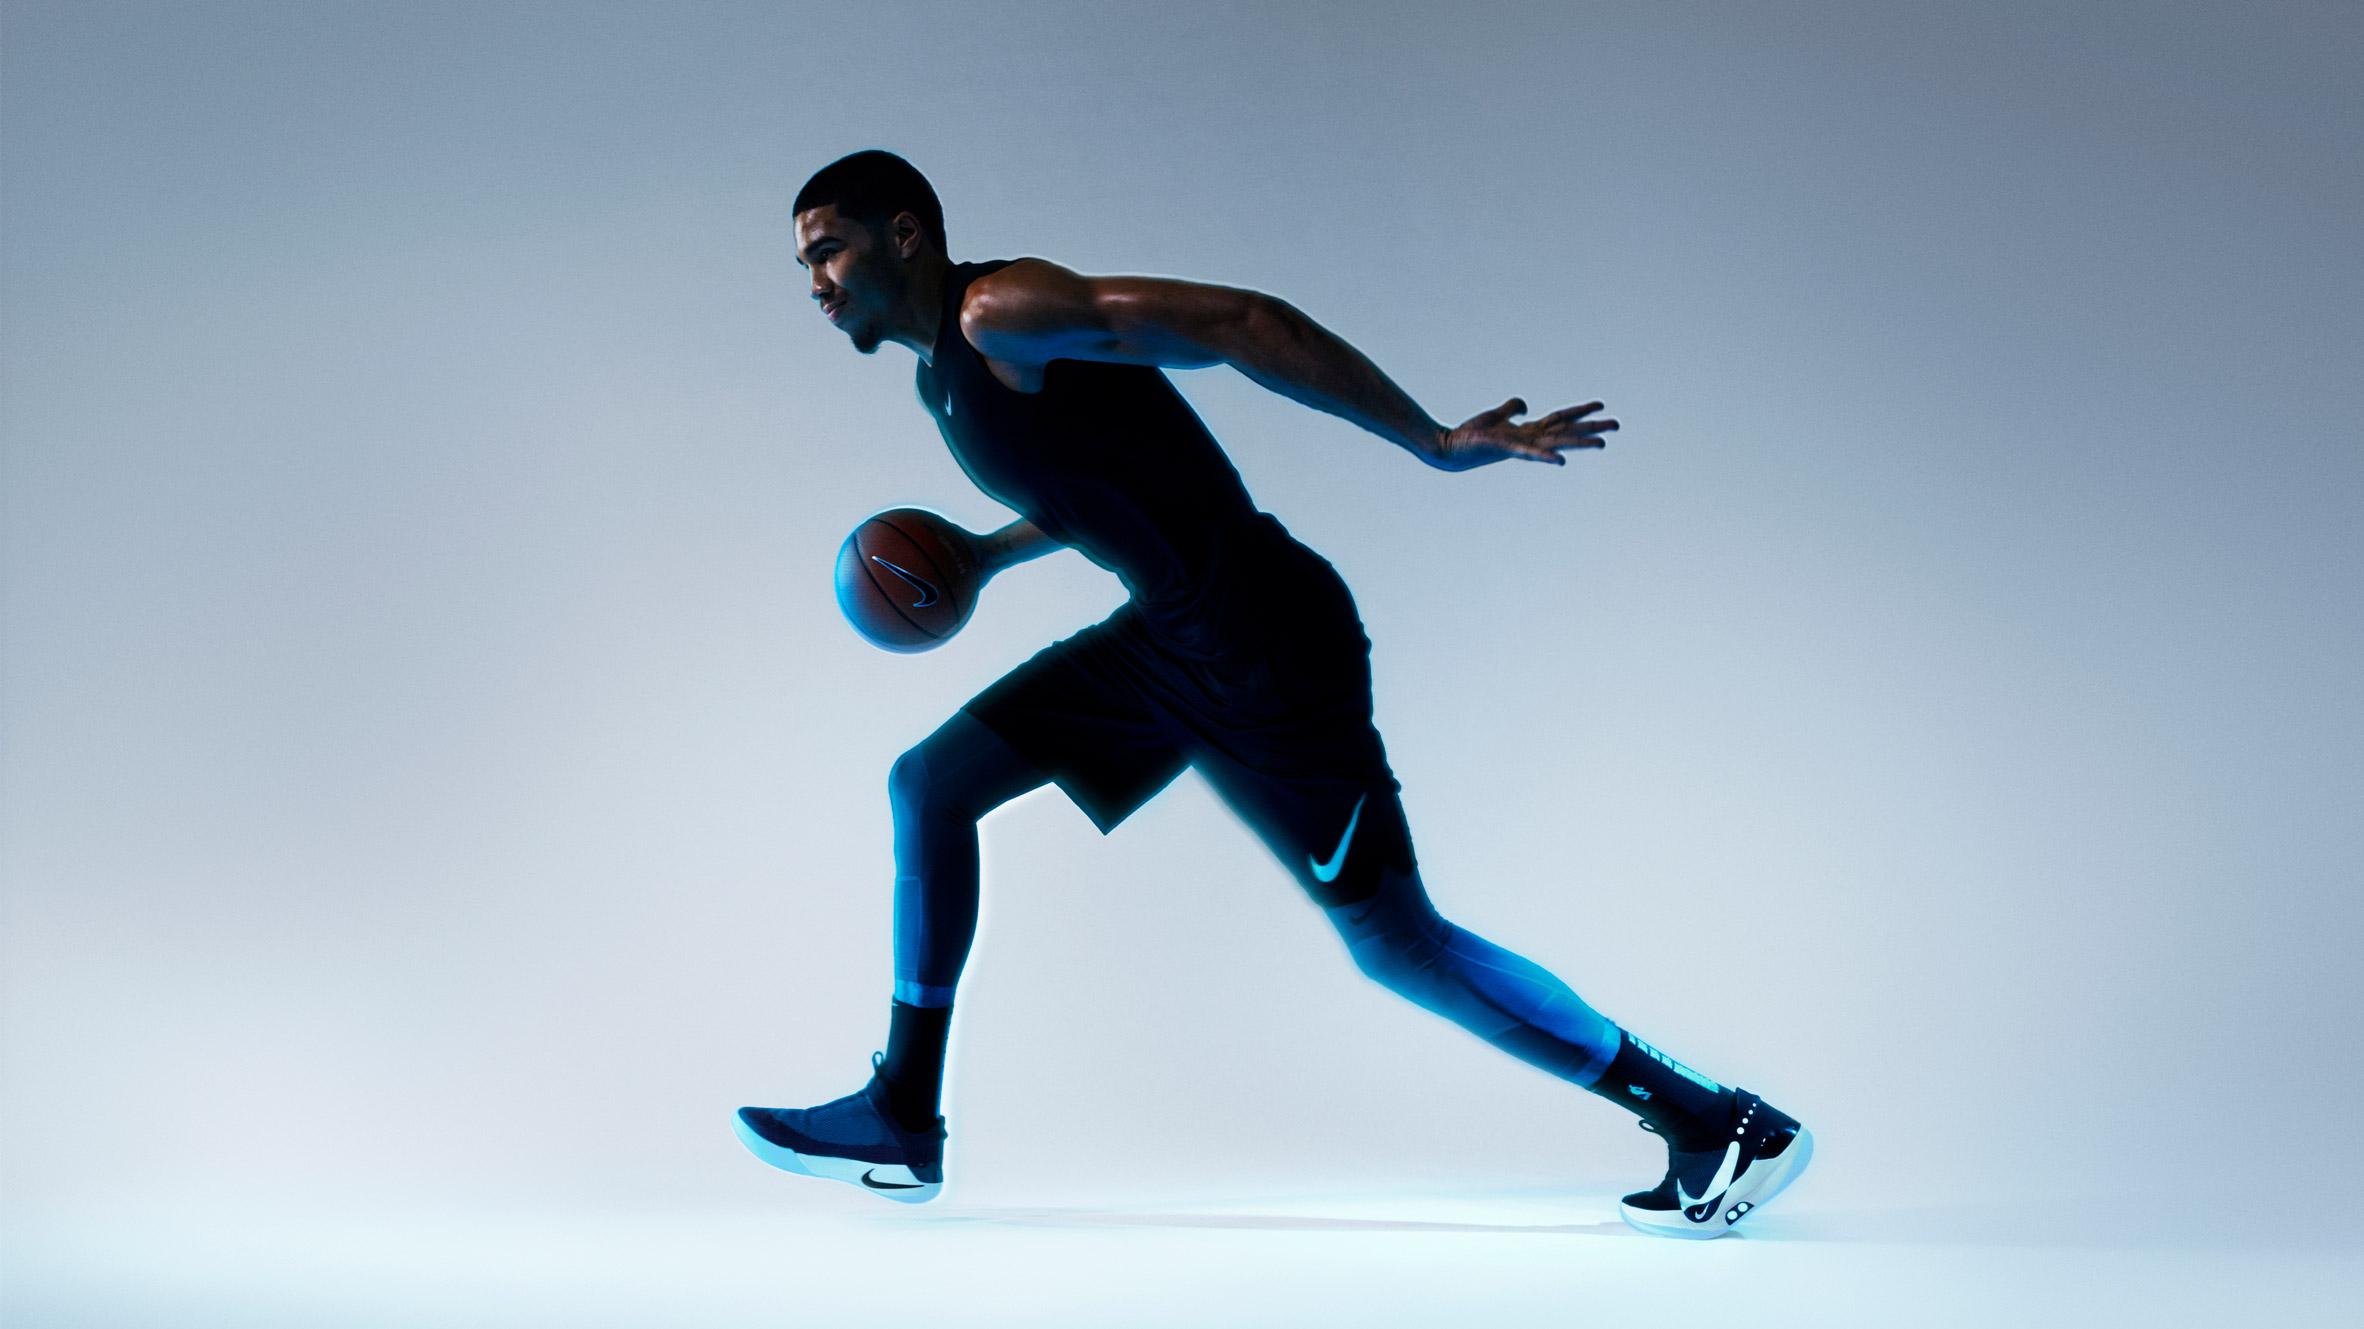 Nike Adapt BB smart basketball sneakers feature self lacing